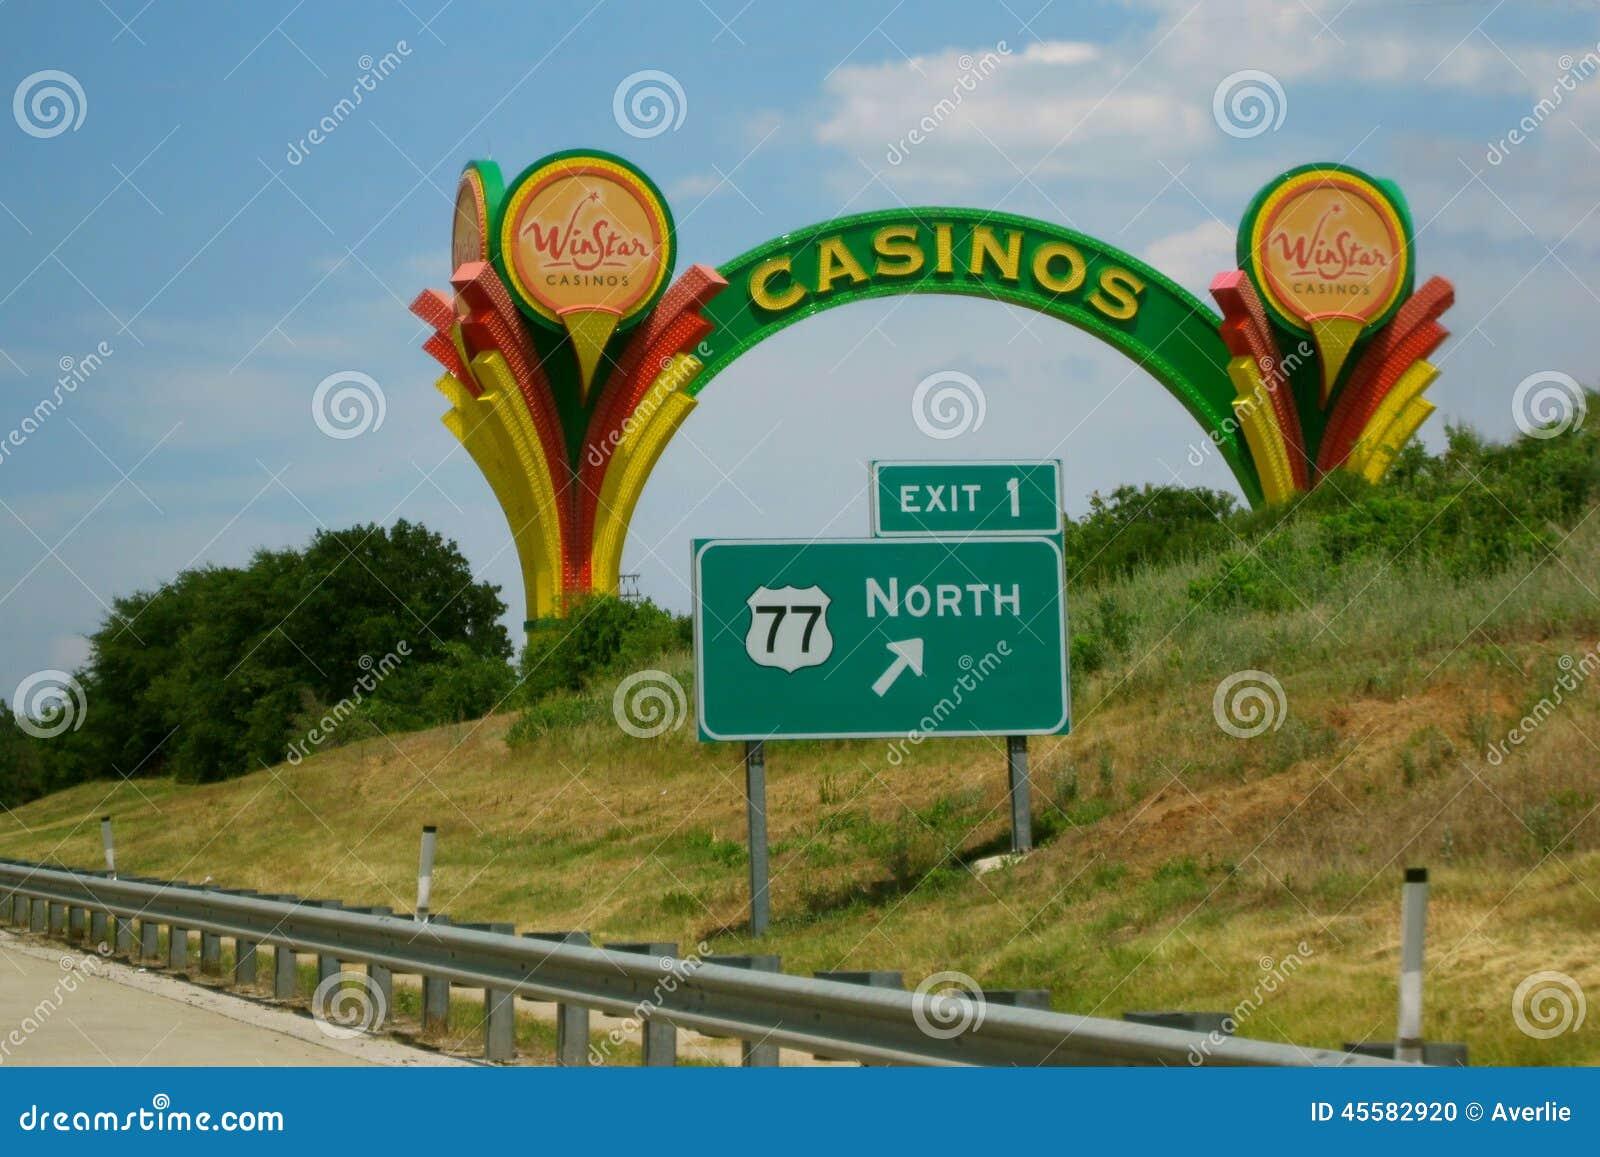 Windstar oklahoma casino entertainment at biloxi gradn casino in mississippi